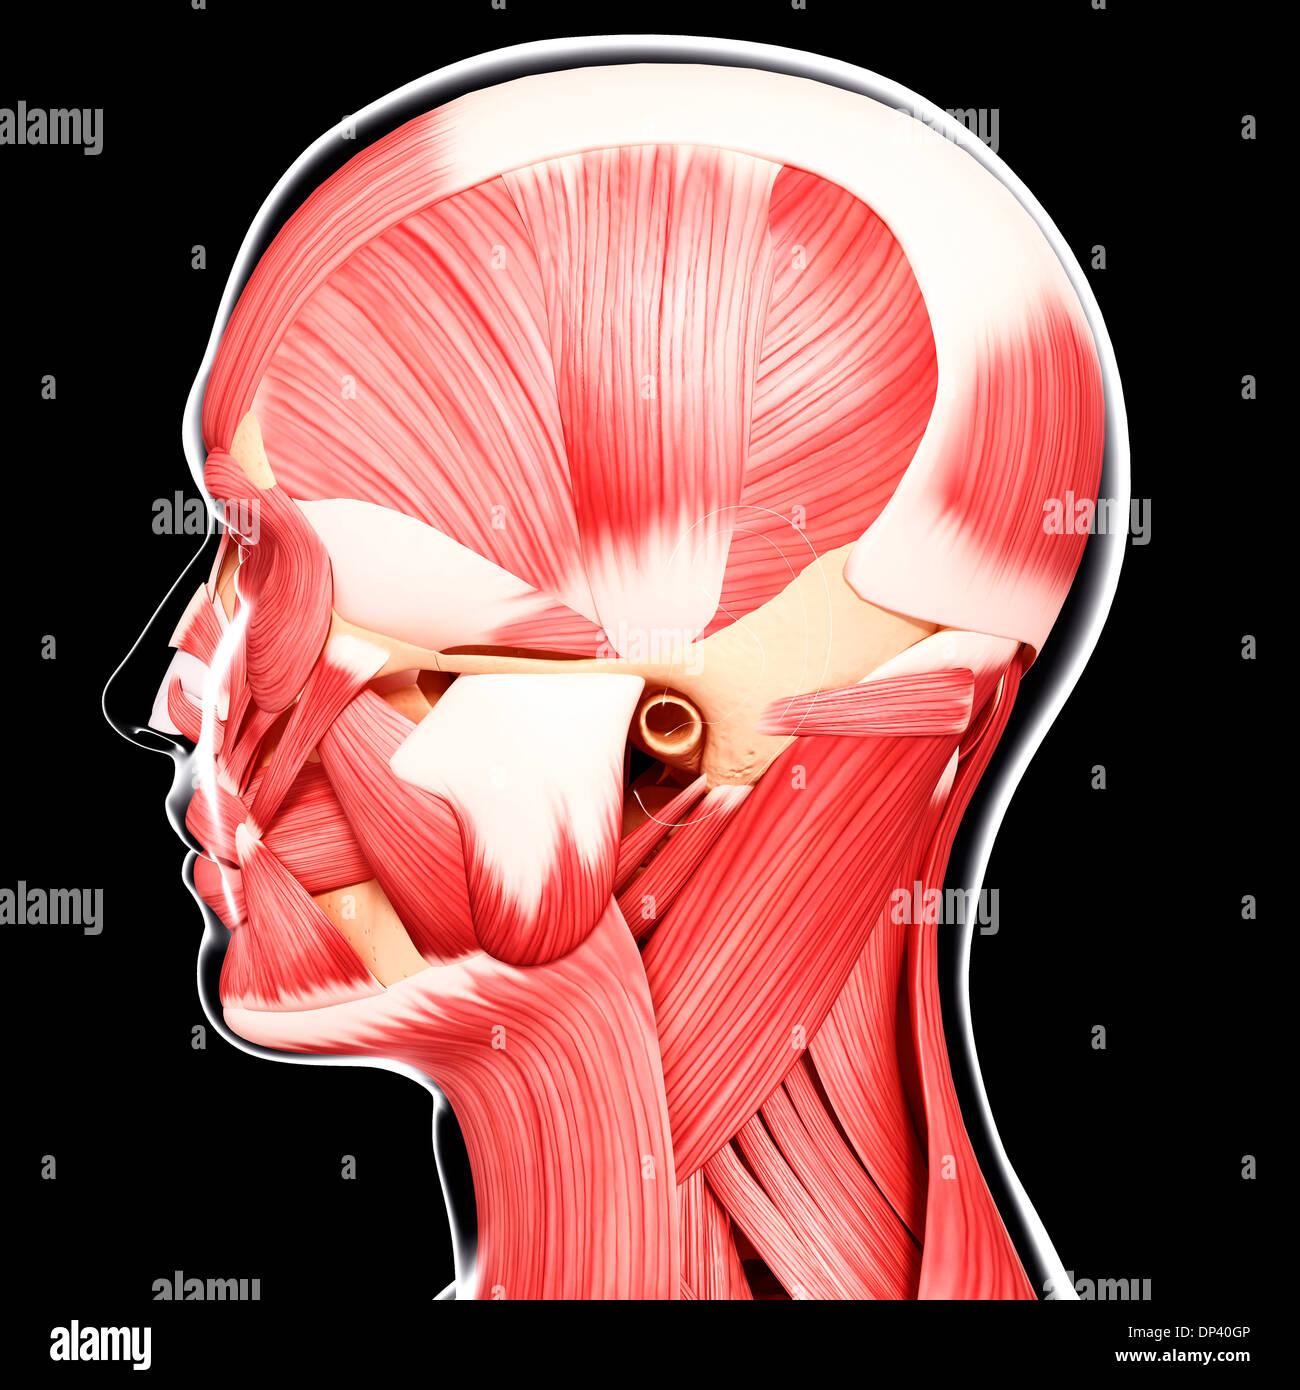 Human head musculature, artwork Stock Photo